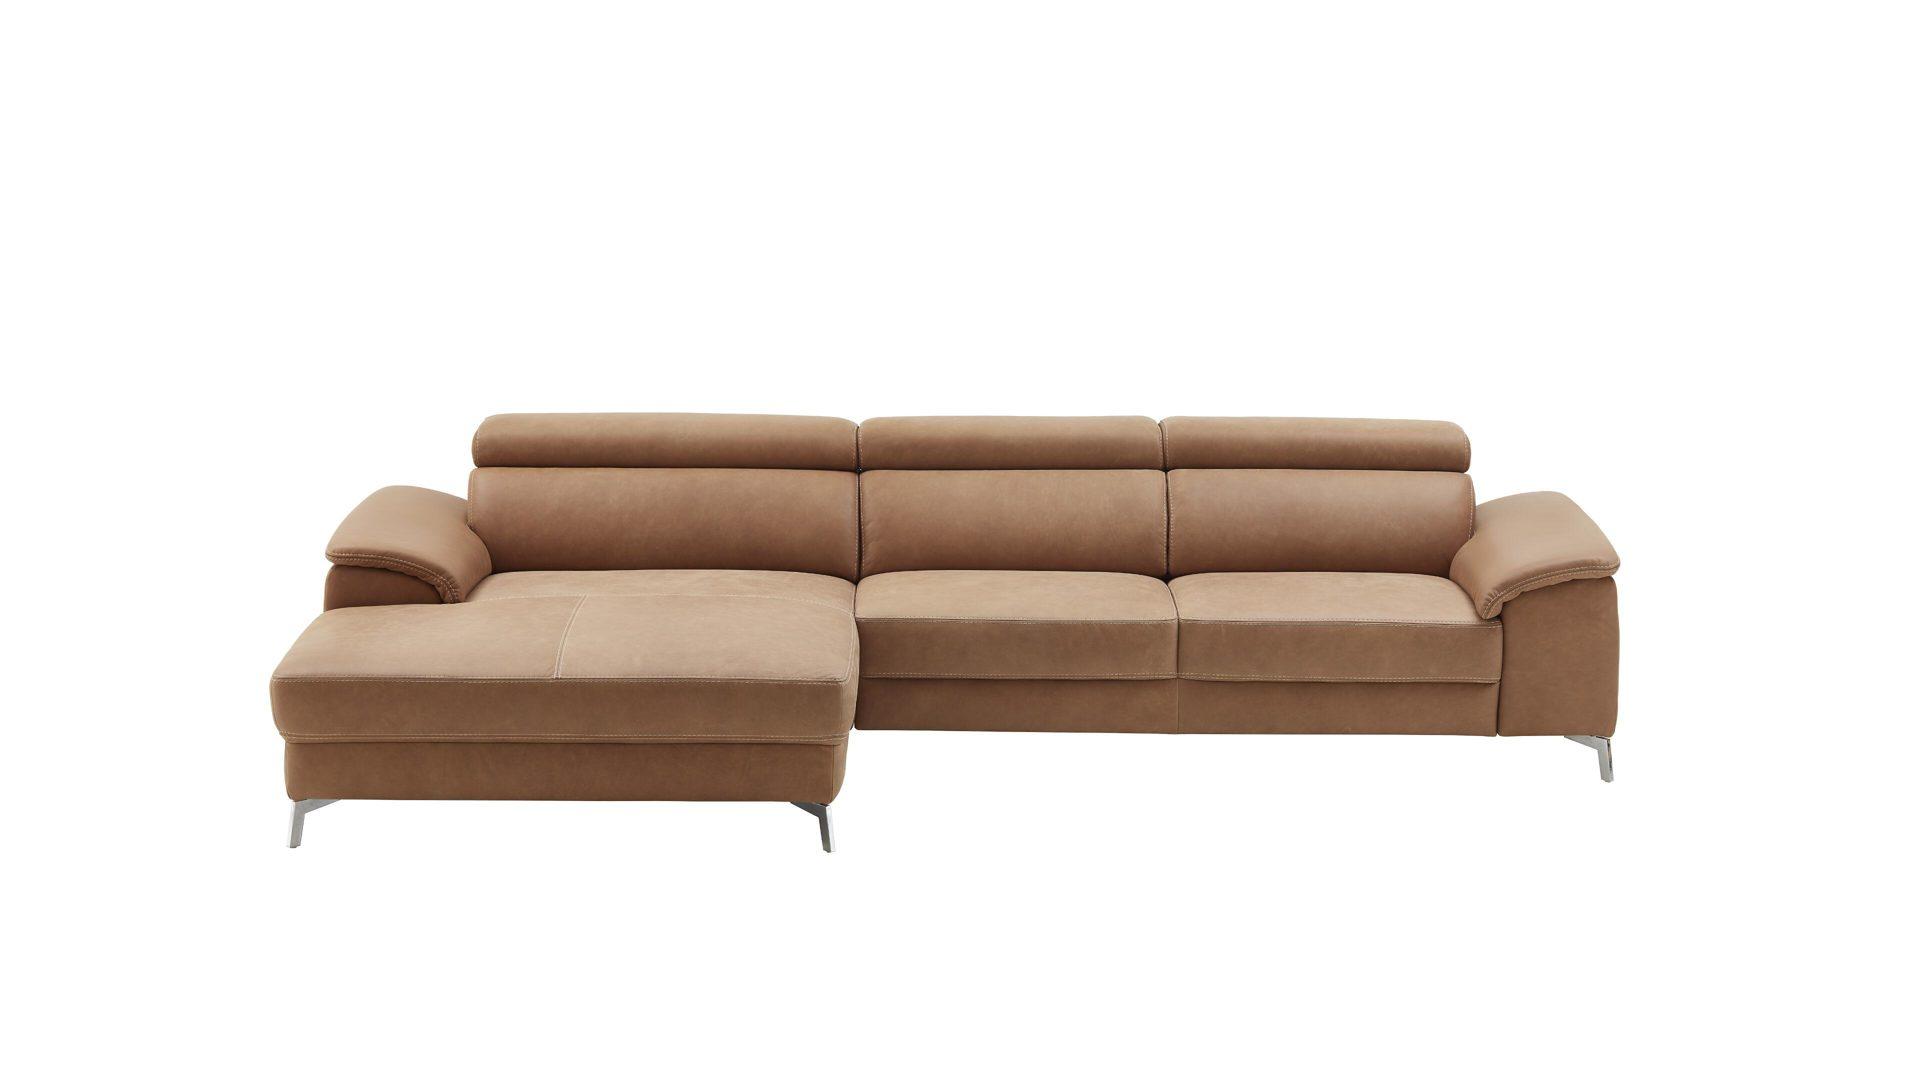 Couches Sofas Sofakultur Eckkombination Kawoo Comfortmaster